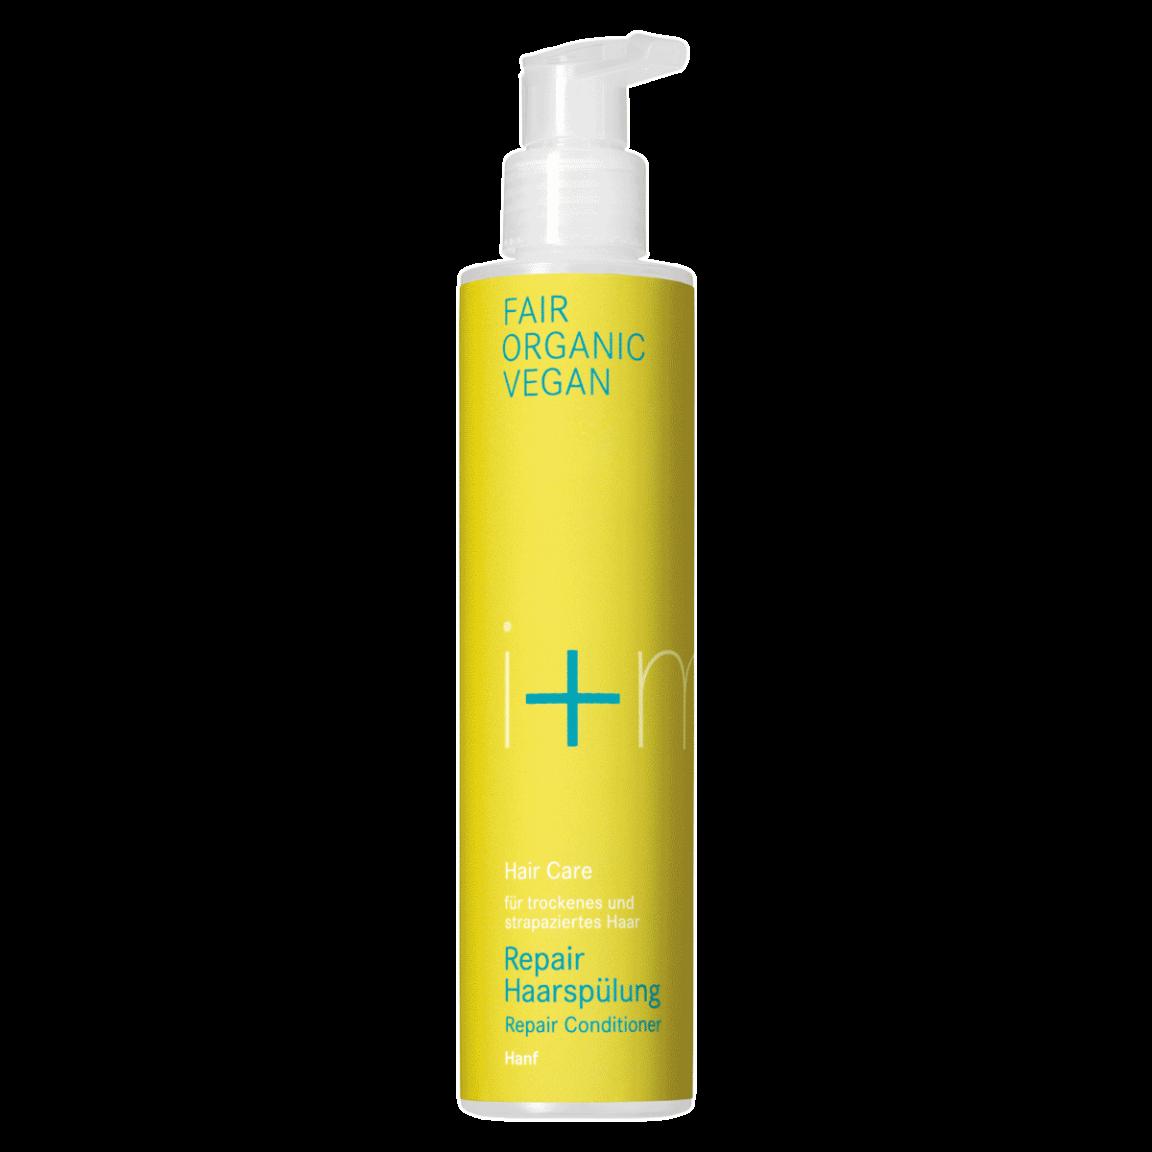 Hair Care Repair Haarspülung von i+m Naturkosmetik - fair bio vegan.